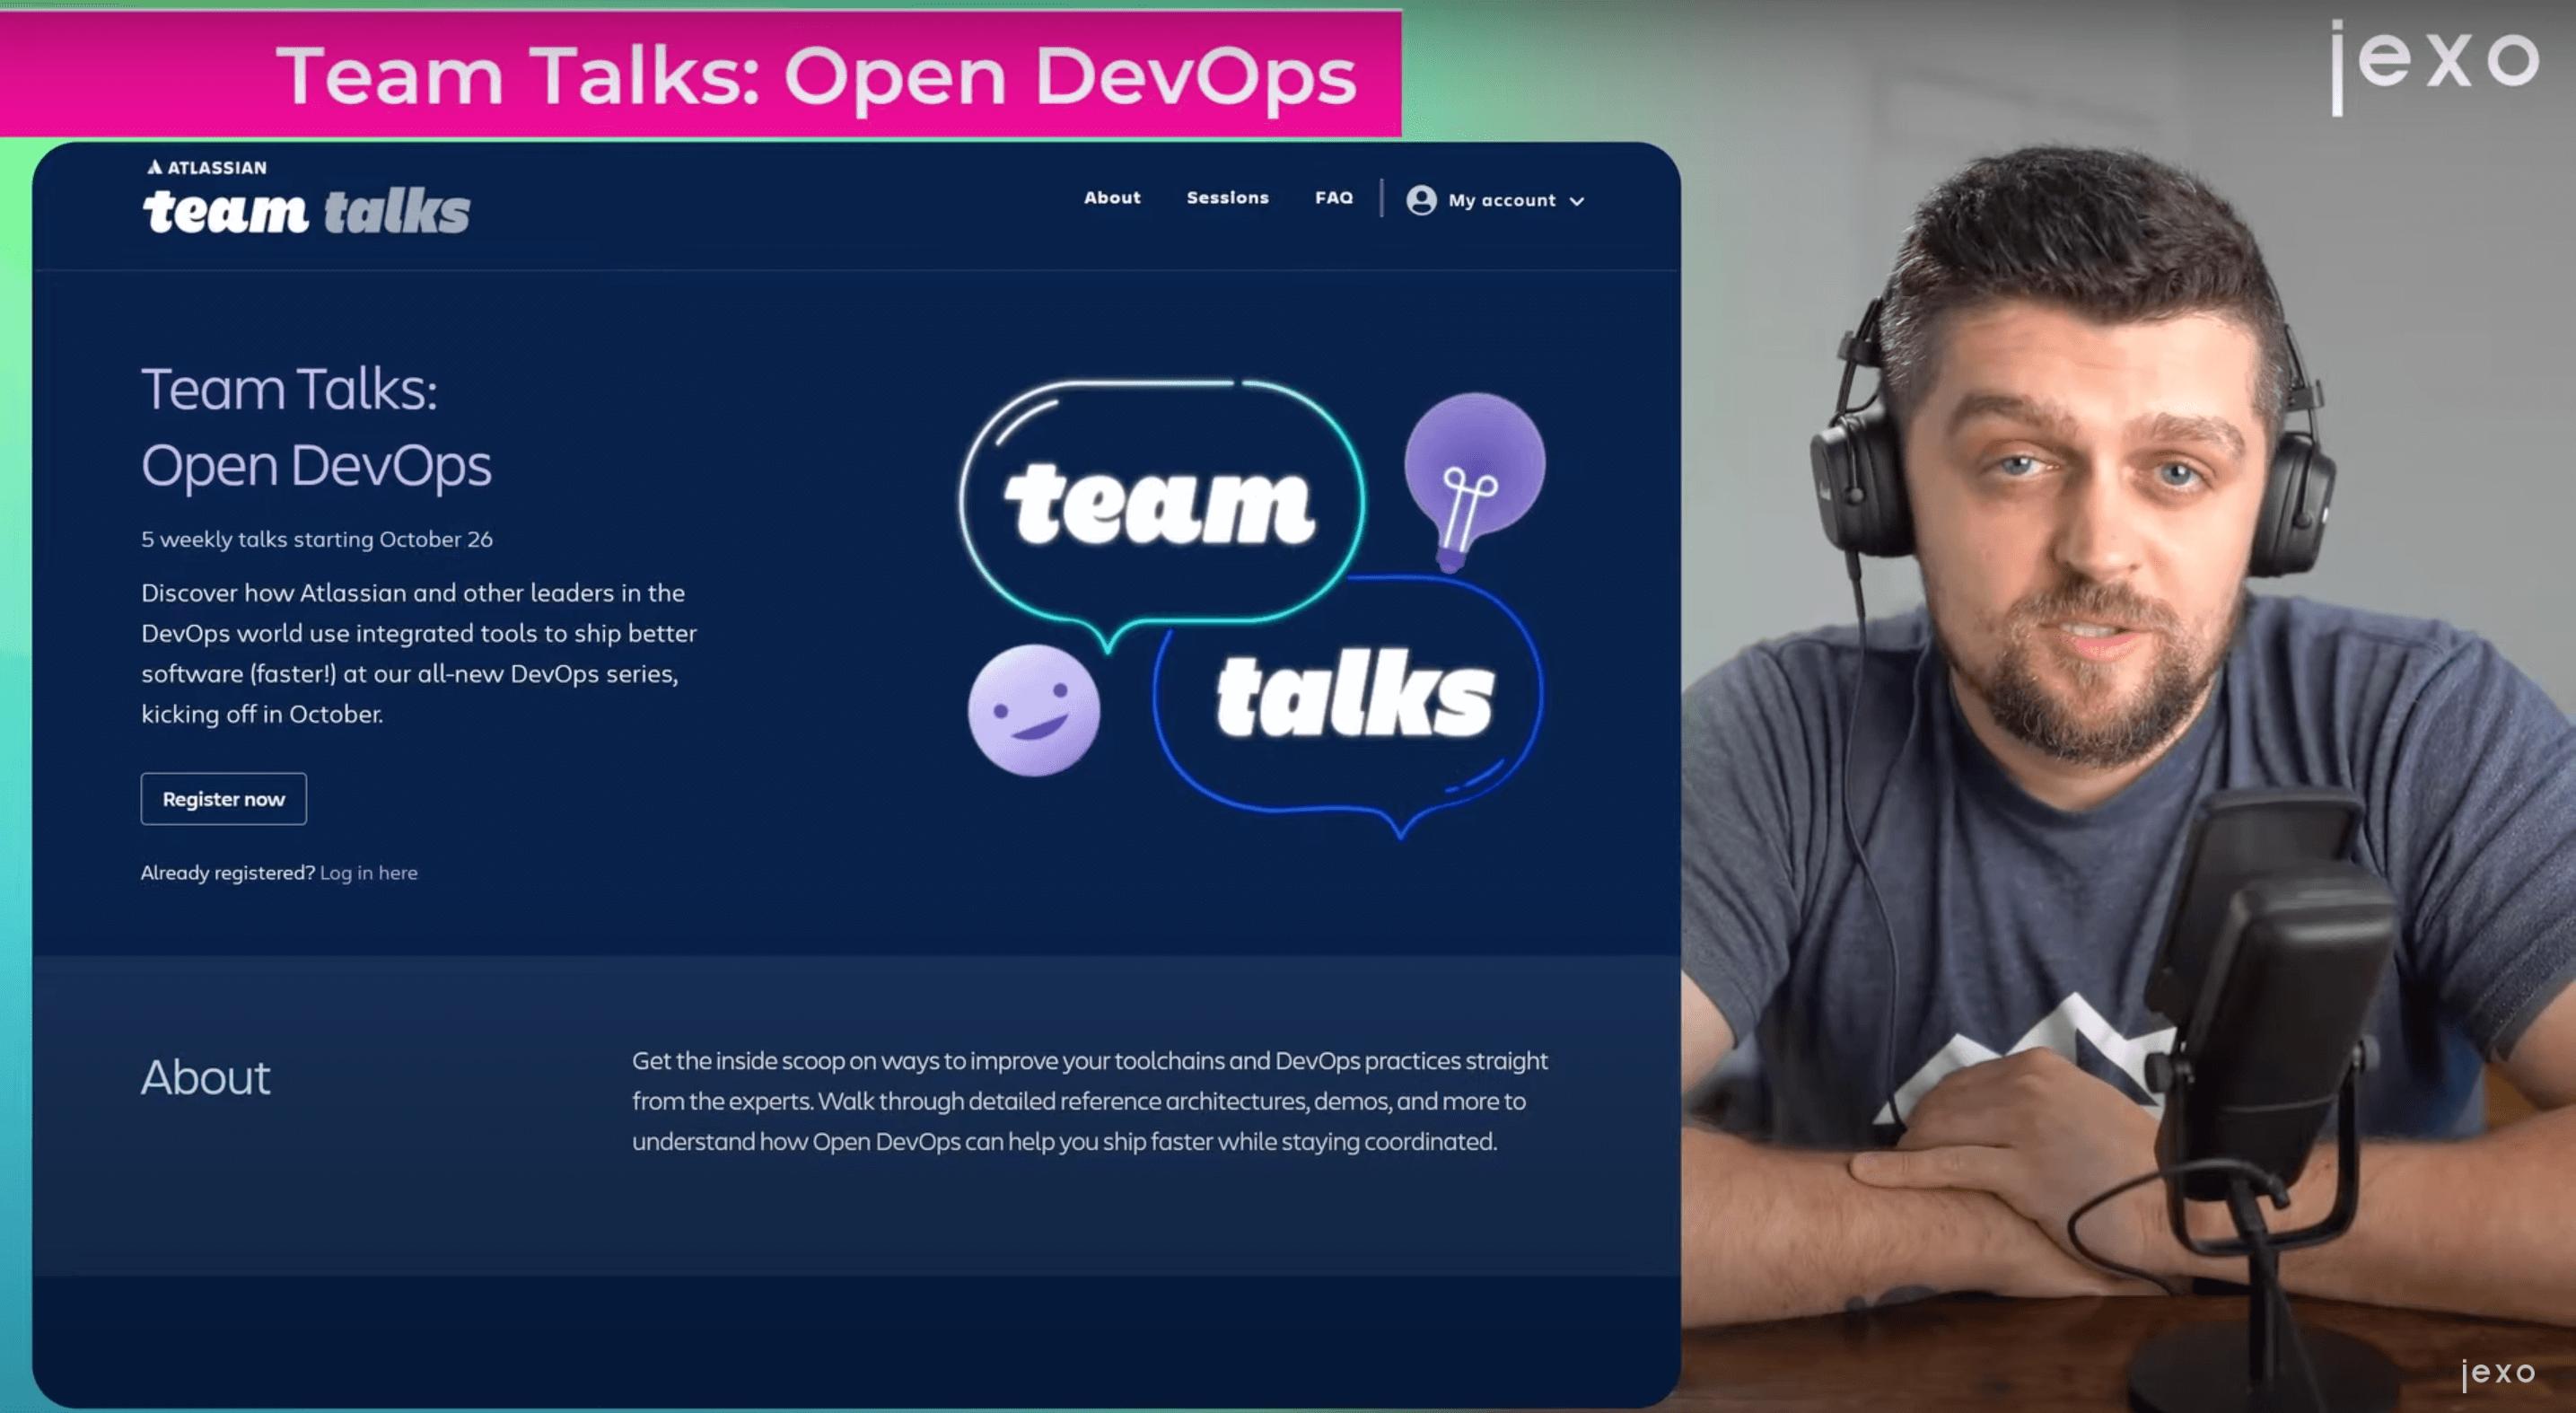 Atlassian news: New team talks - DevOps